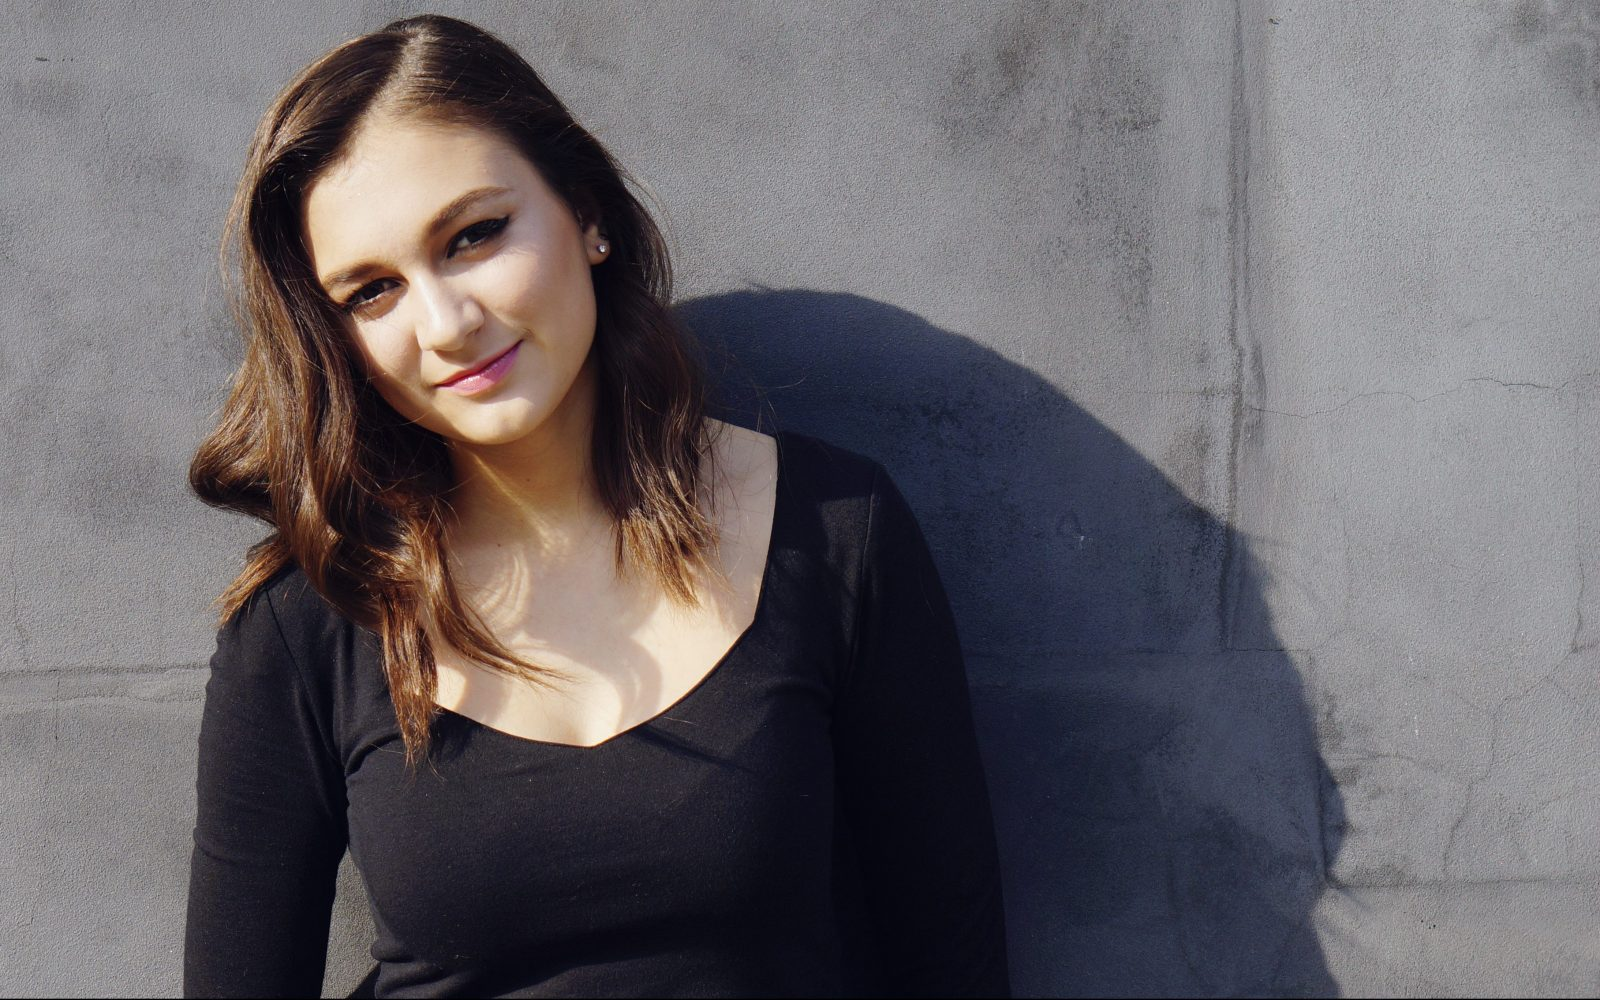 Pictures Of Daya Singer